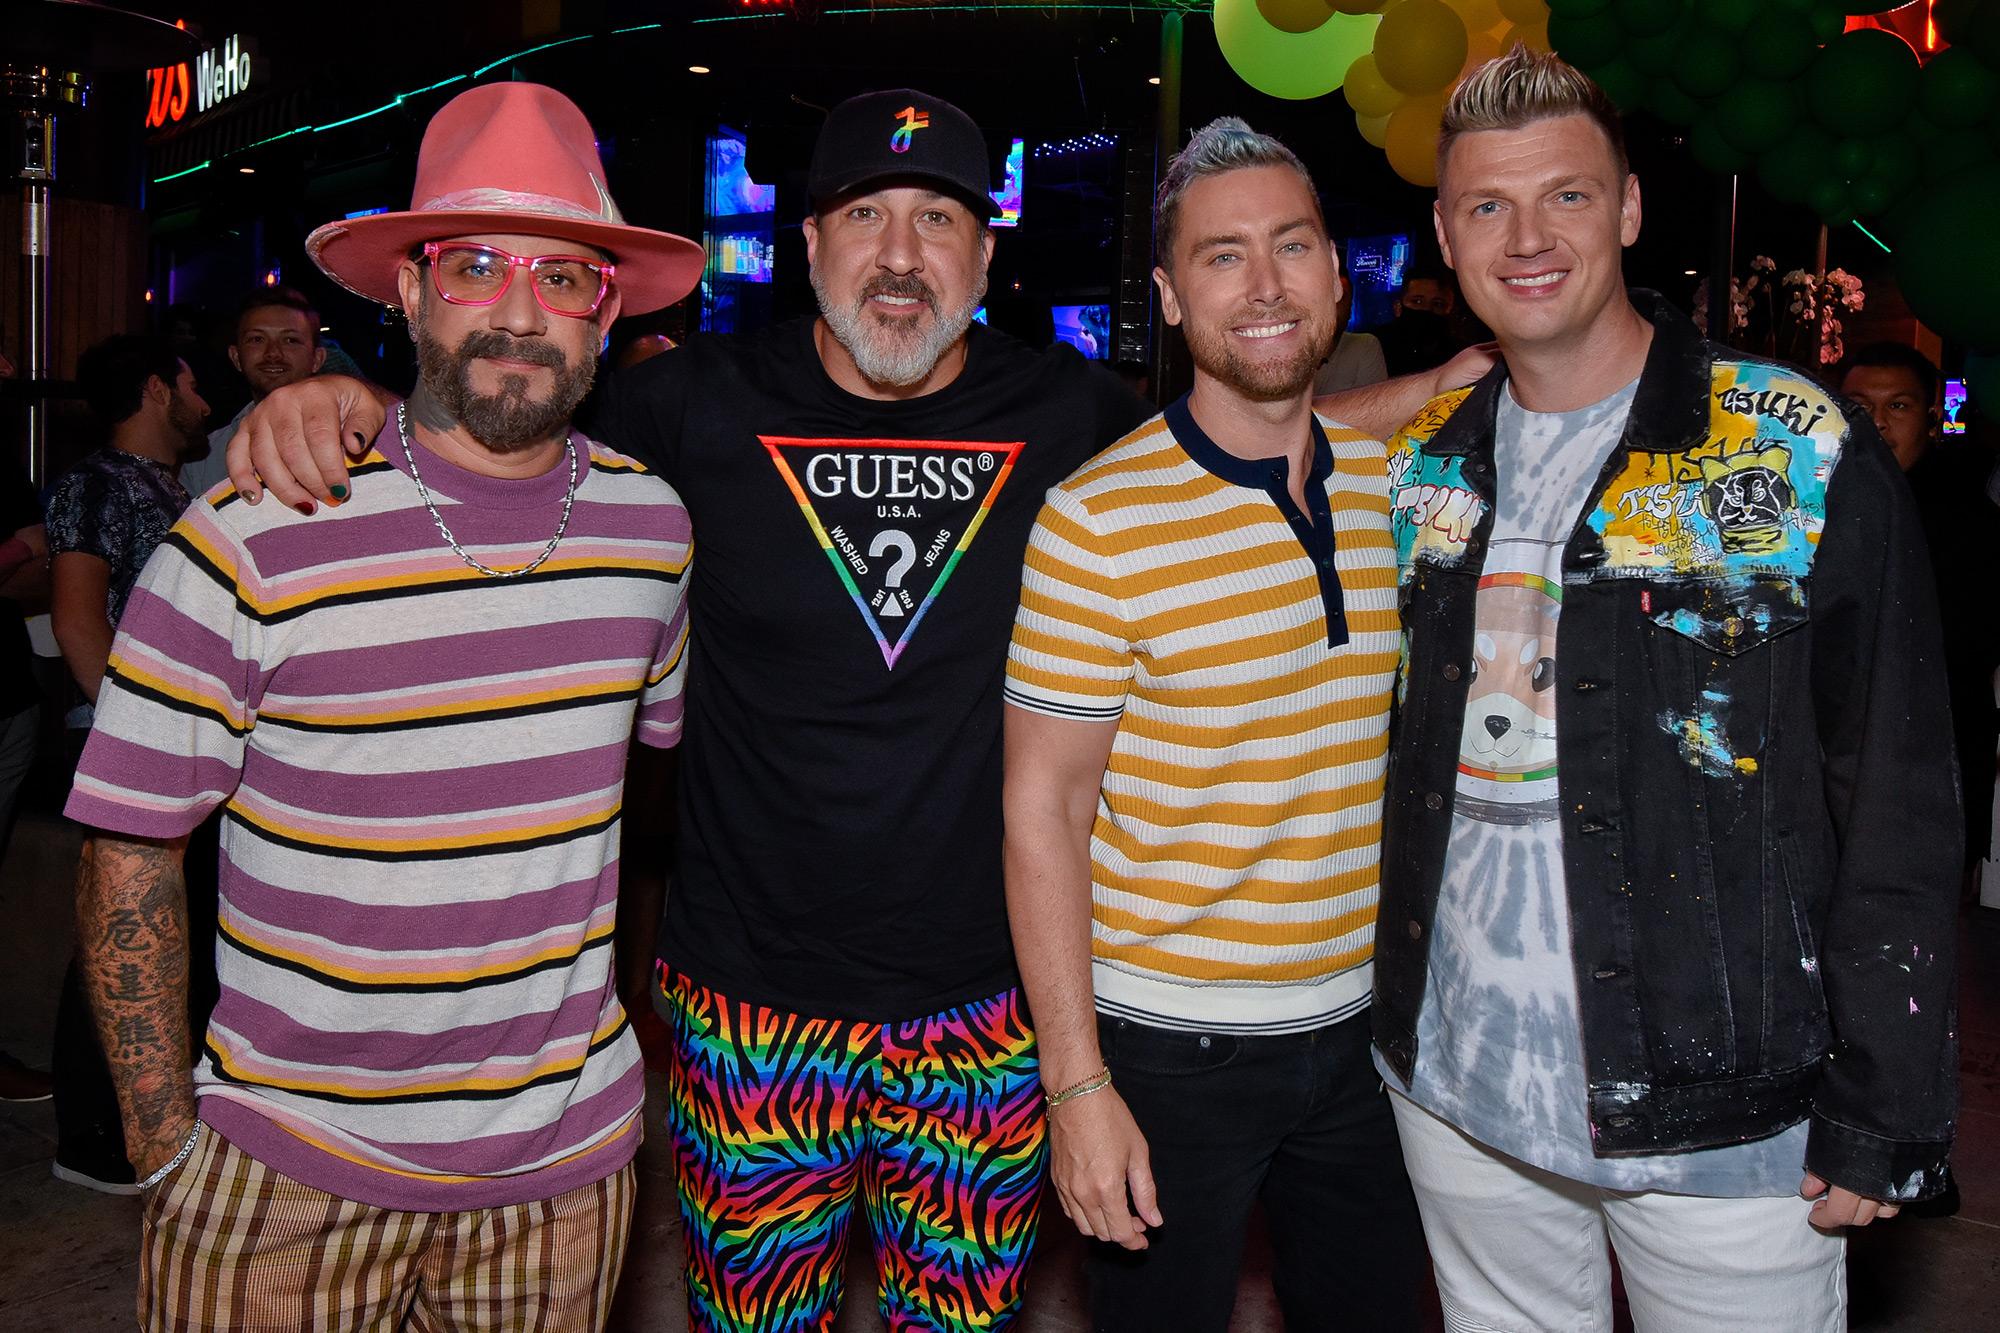 NSYNC And Backstreet Boys